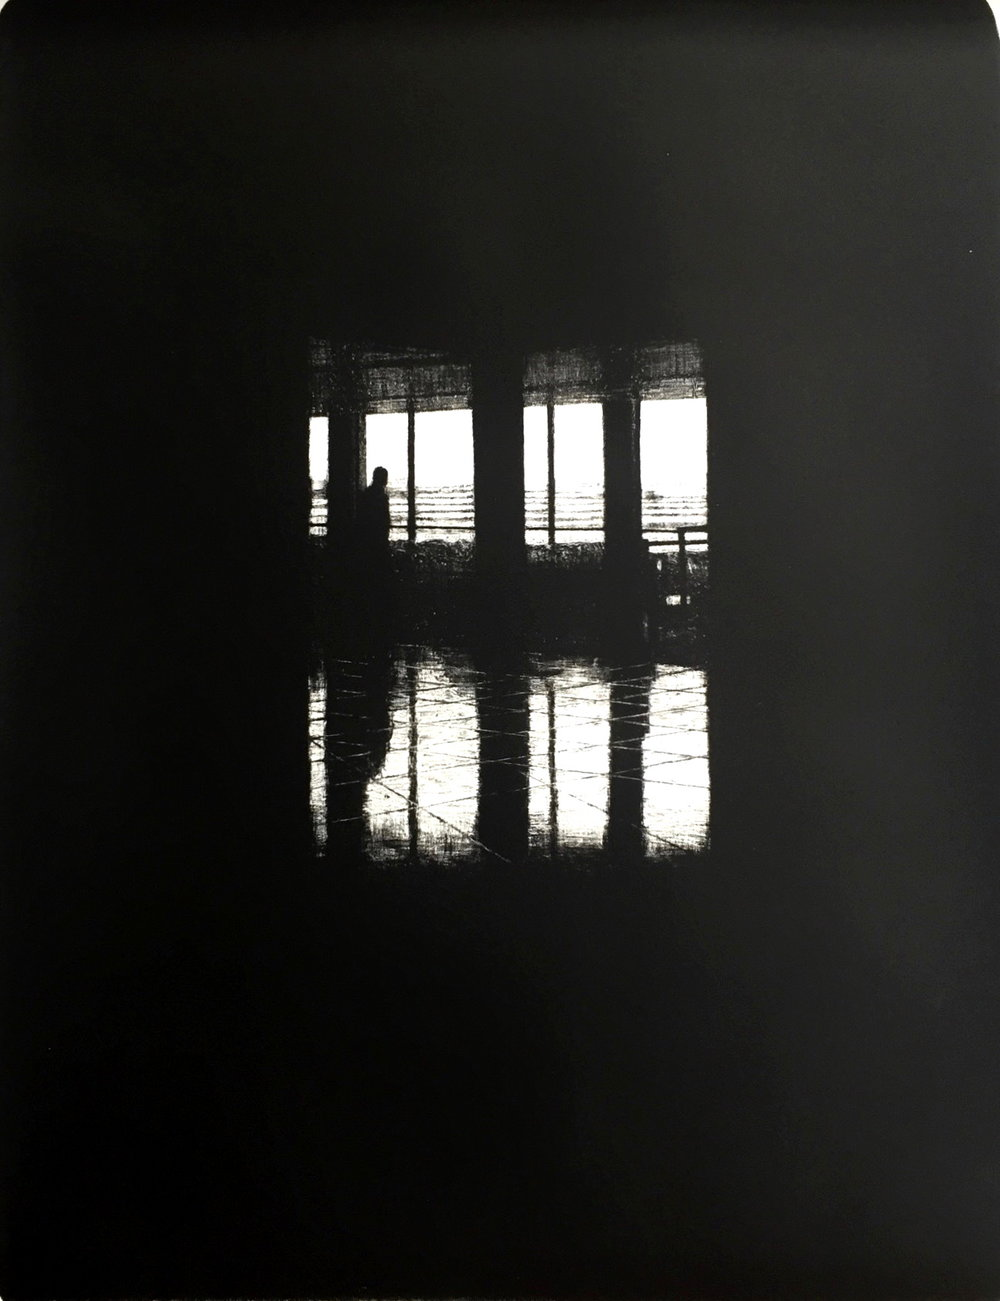 Departures III (JFK), 2016, lithograph, 55cm x 75cm